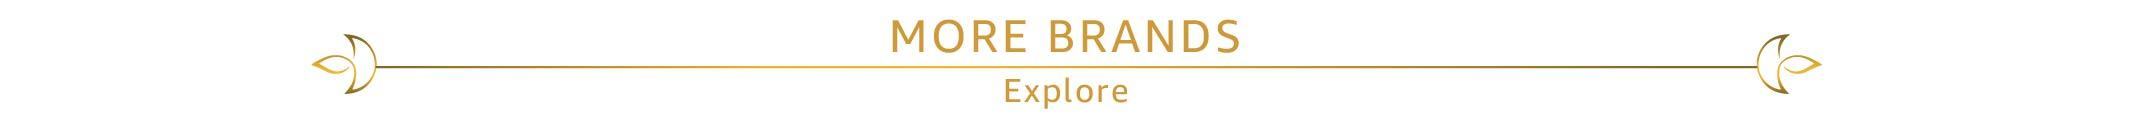 More Brands